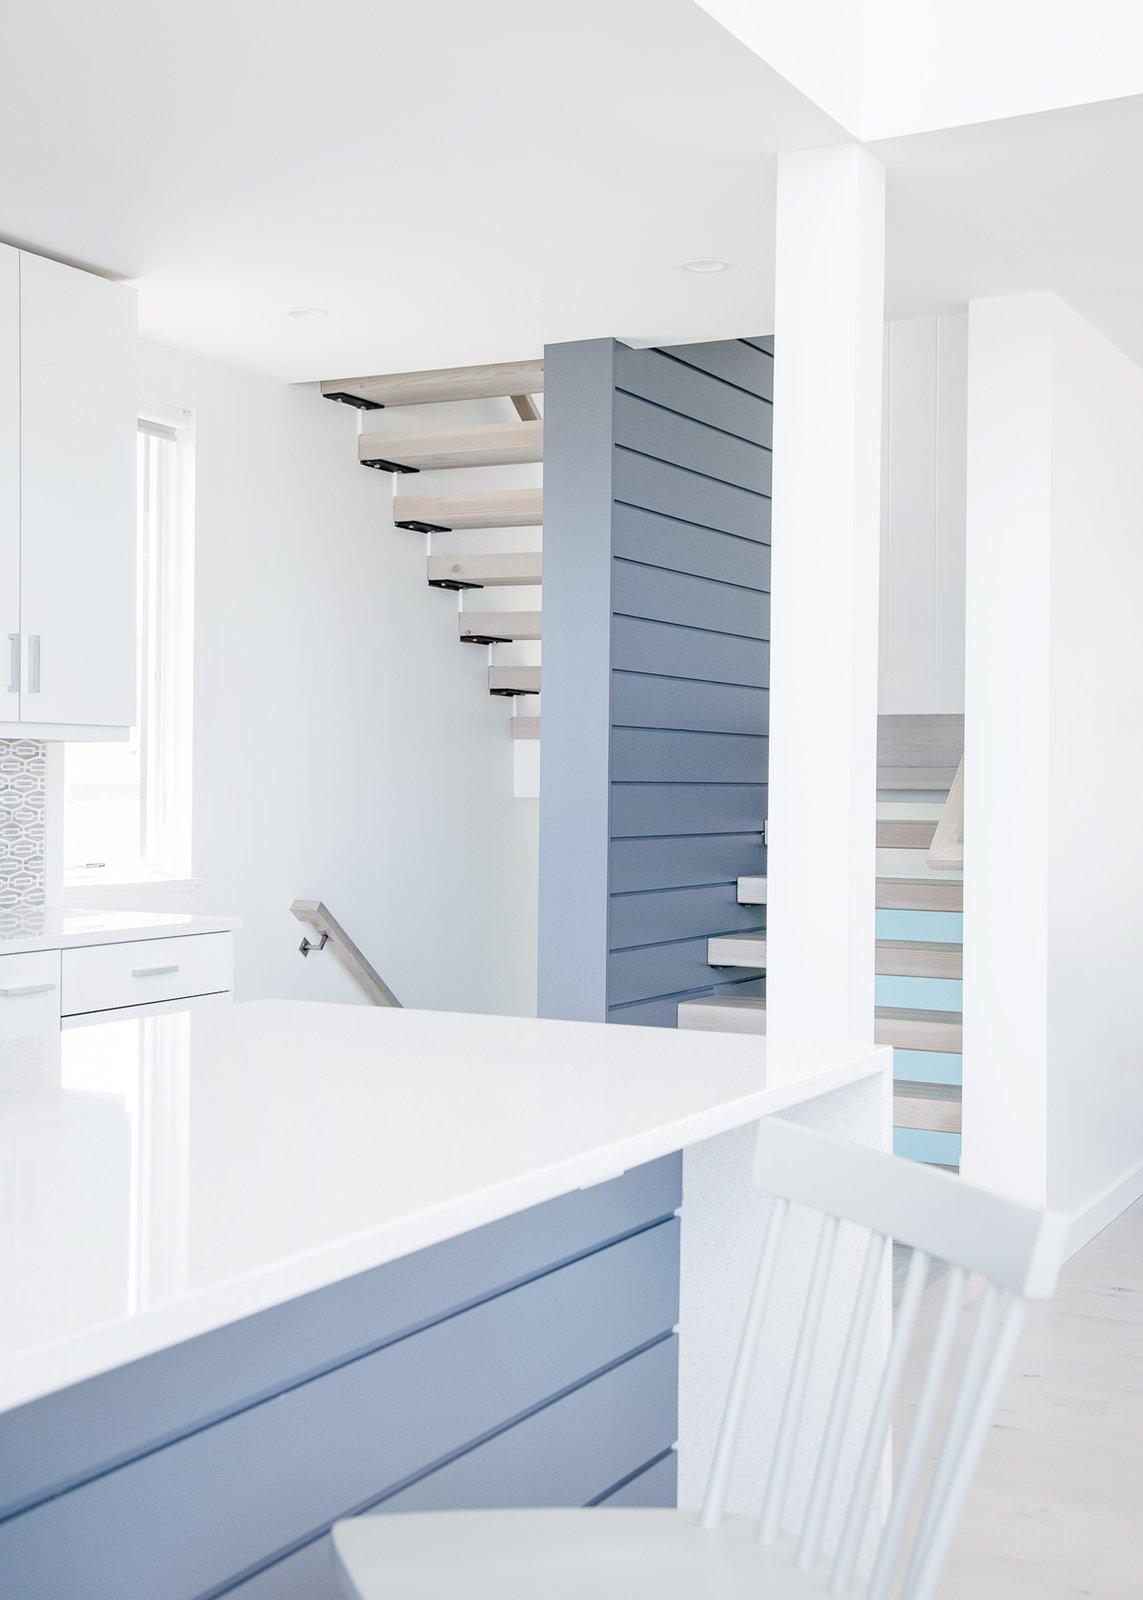 Kitchen, White Cabinet, Engineered Quartz Counter, Light Hardwood Floor, and Mosaic Tile Backsplashe Kitchen and stair  Sea Bright House by Jeff Jordan Architects